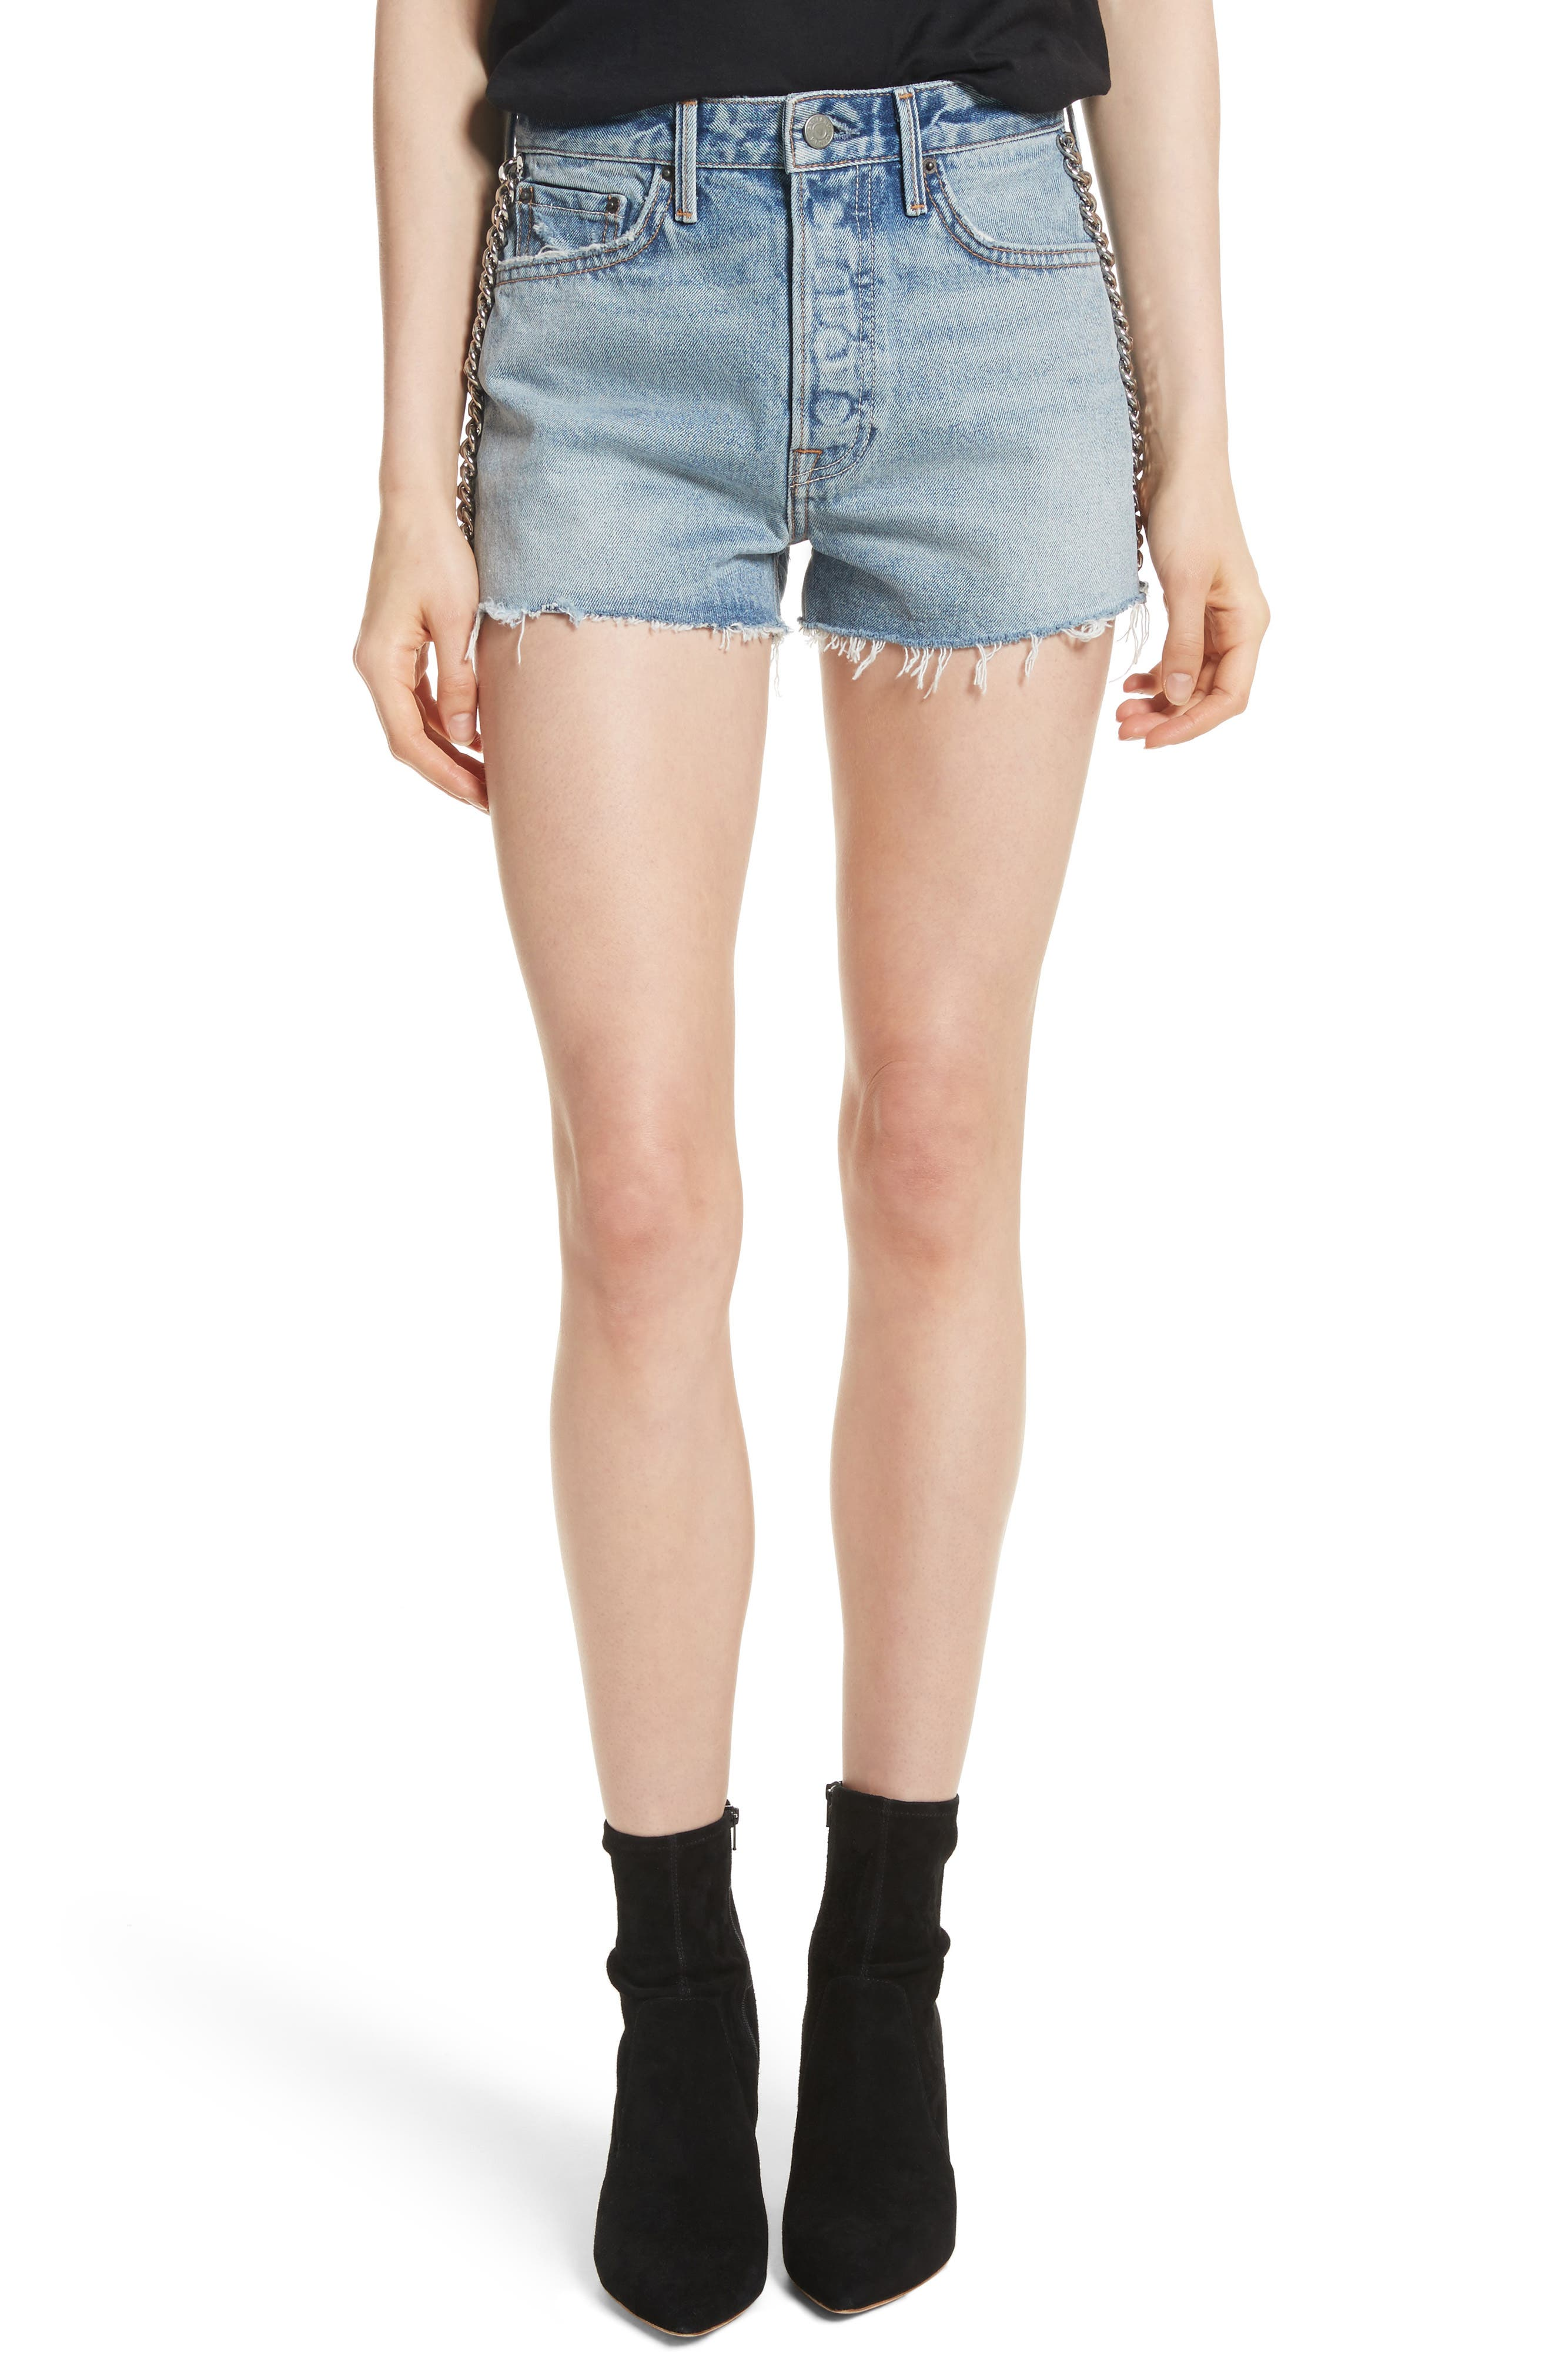 Cindy Rigid High Waist Denim Shorts,                             Main thumbnail 1, color,                             484